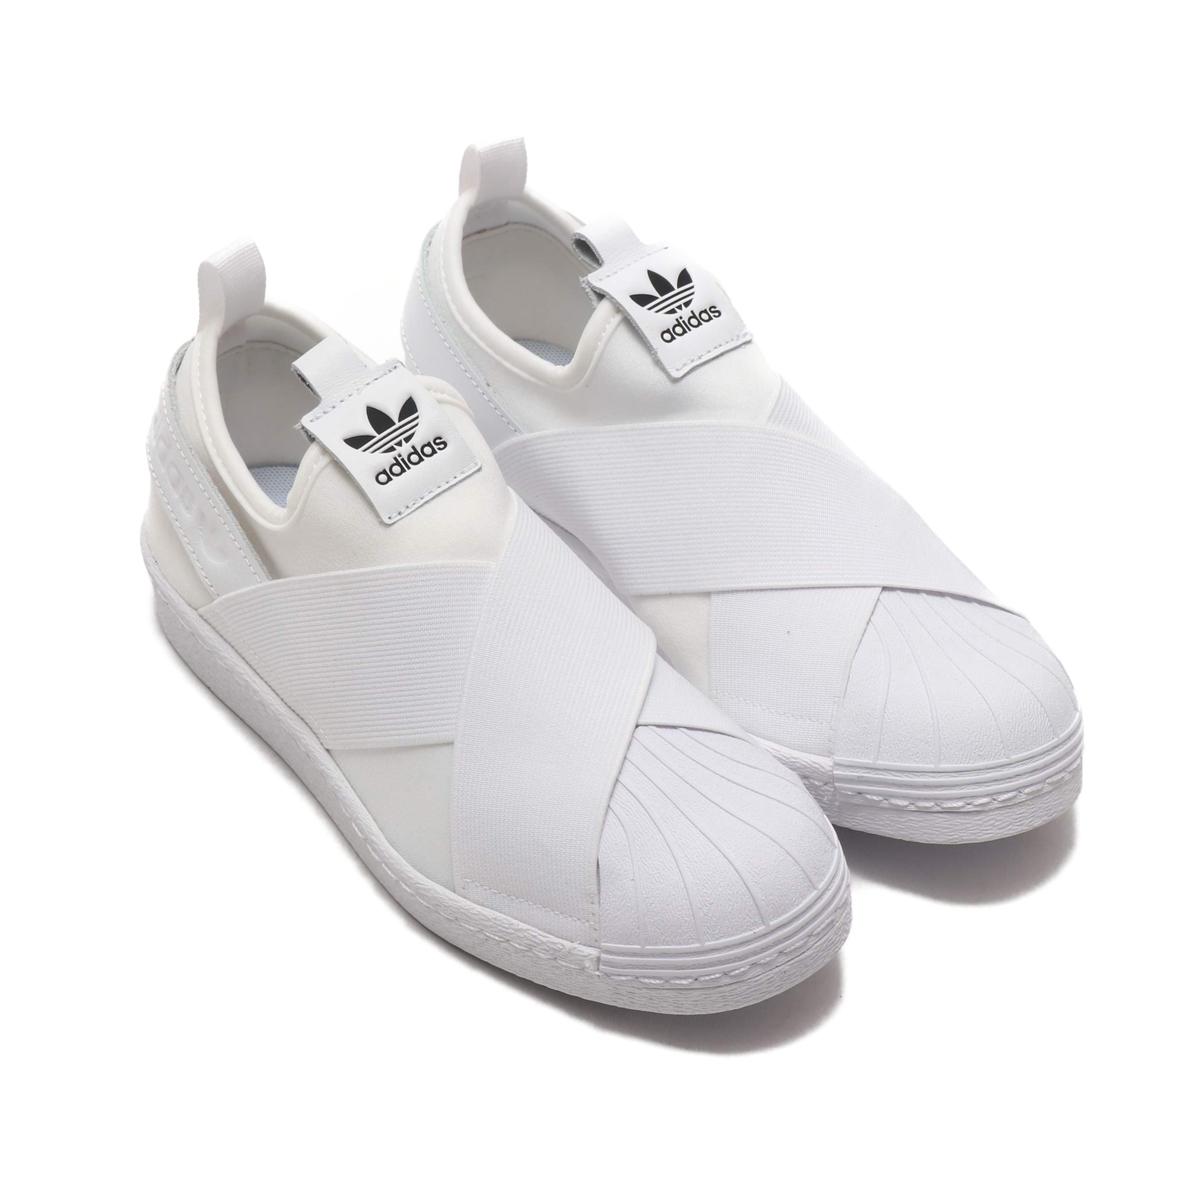 eb03c1b1b265 adidas Originals SUPER STAR SLIP ON W (Adidas originals superstar slip-on)  RUNNING WHITE RUNNING WHITE CORE BLACK CRYOVR